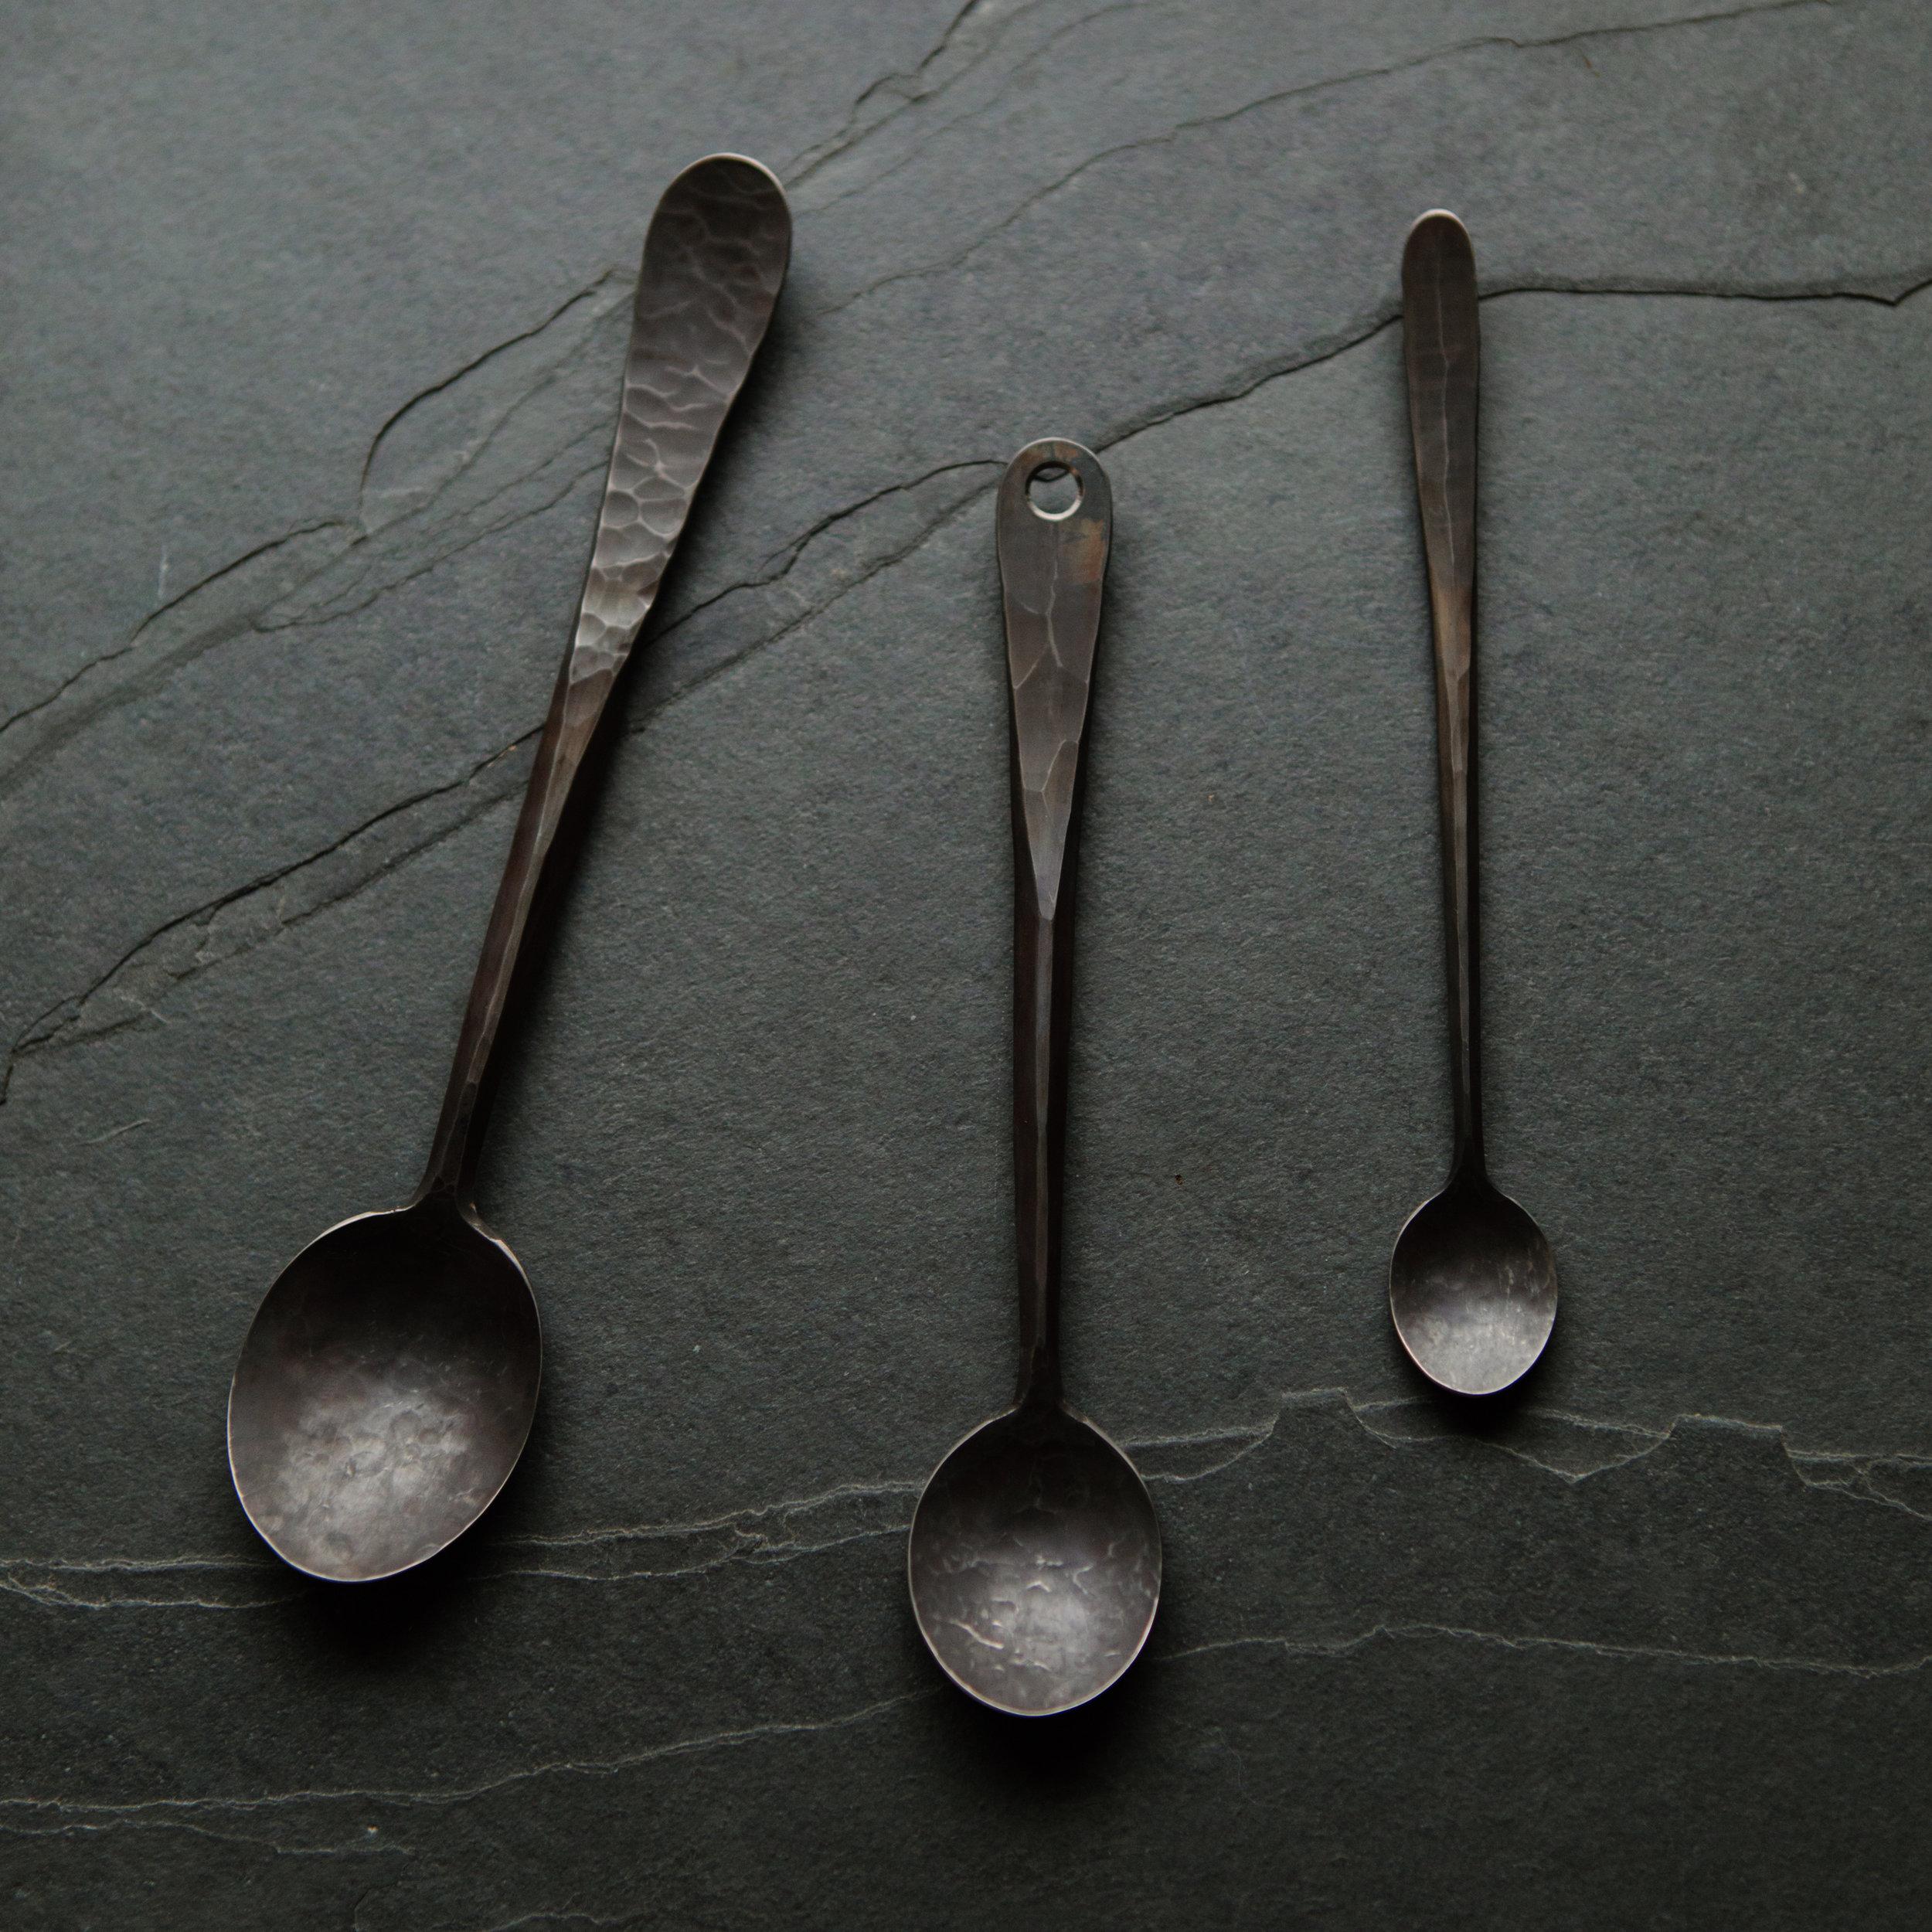 April Handforged Anium Spoons Var 1 3 Black Swan Handmade